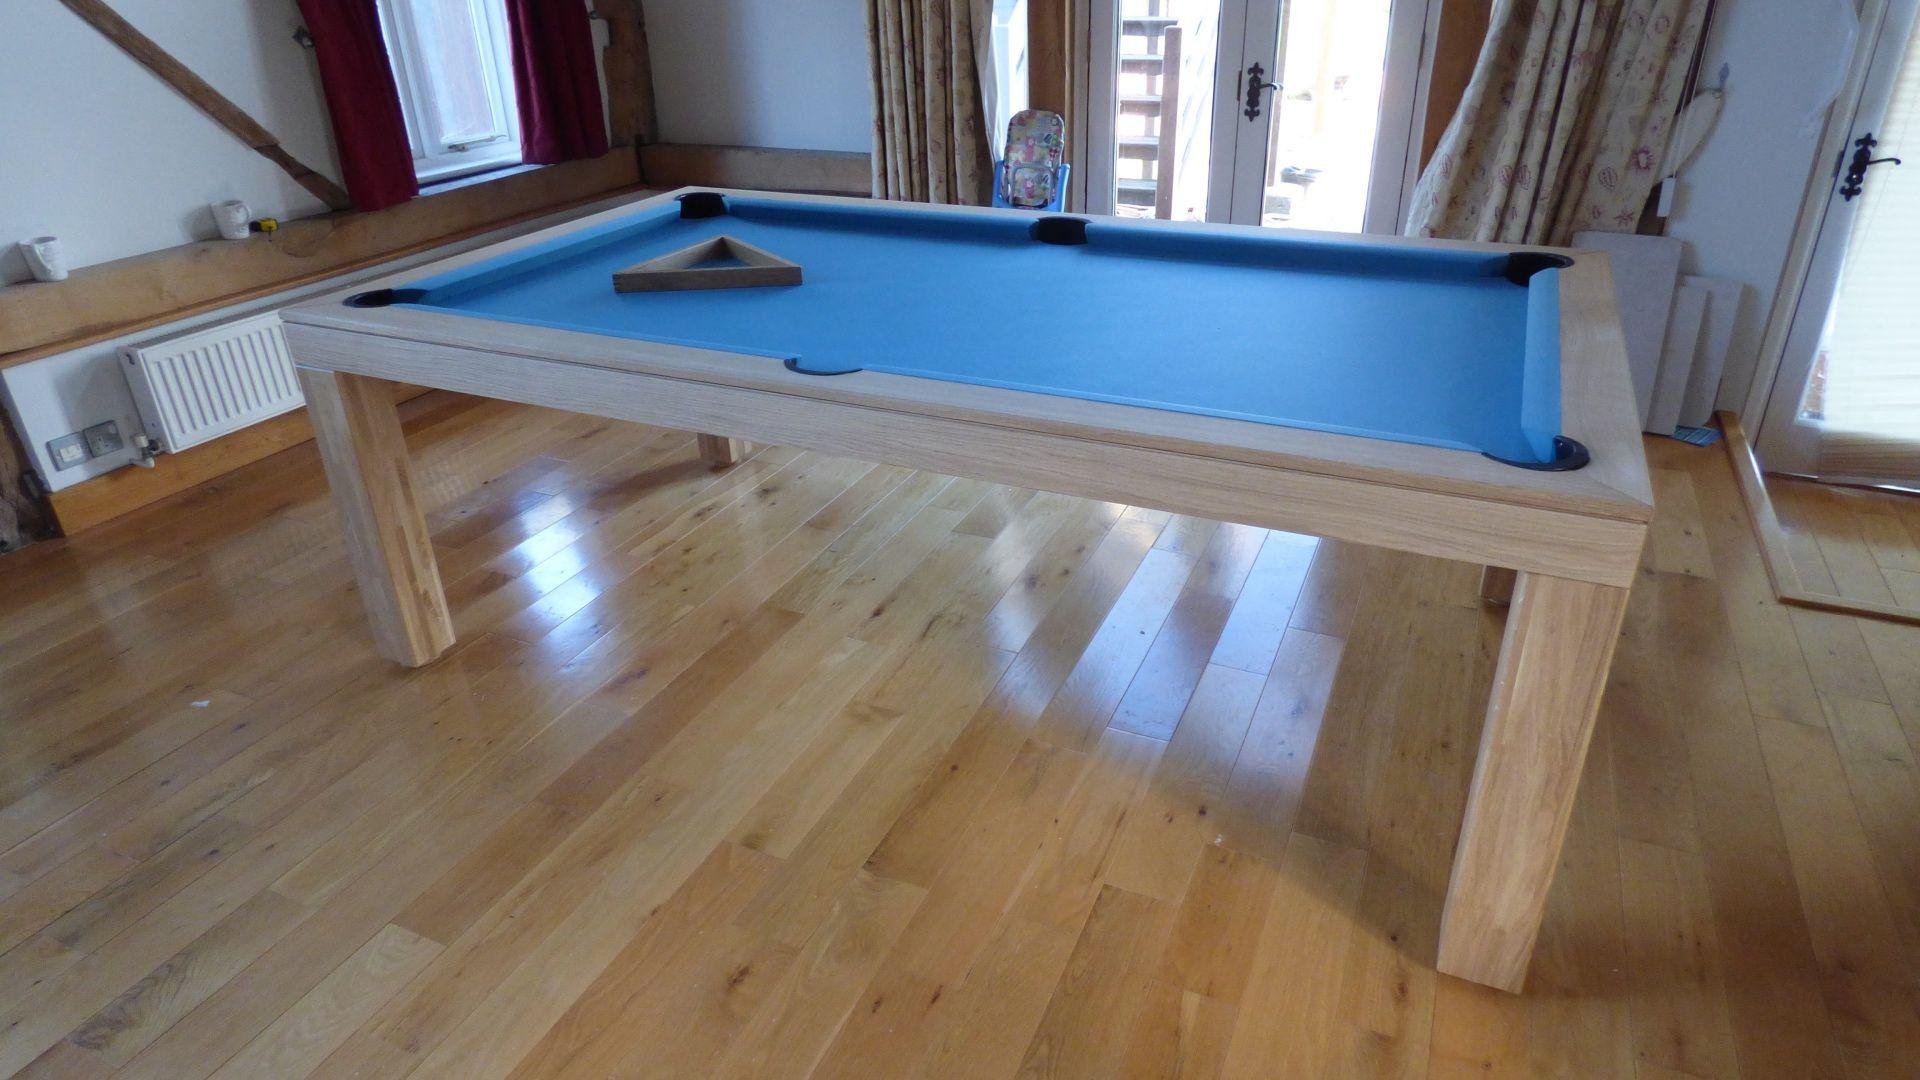 American Contemporary Pool Table Oak Wood Colour Matt - Electric blue pool table